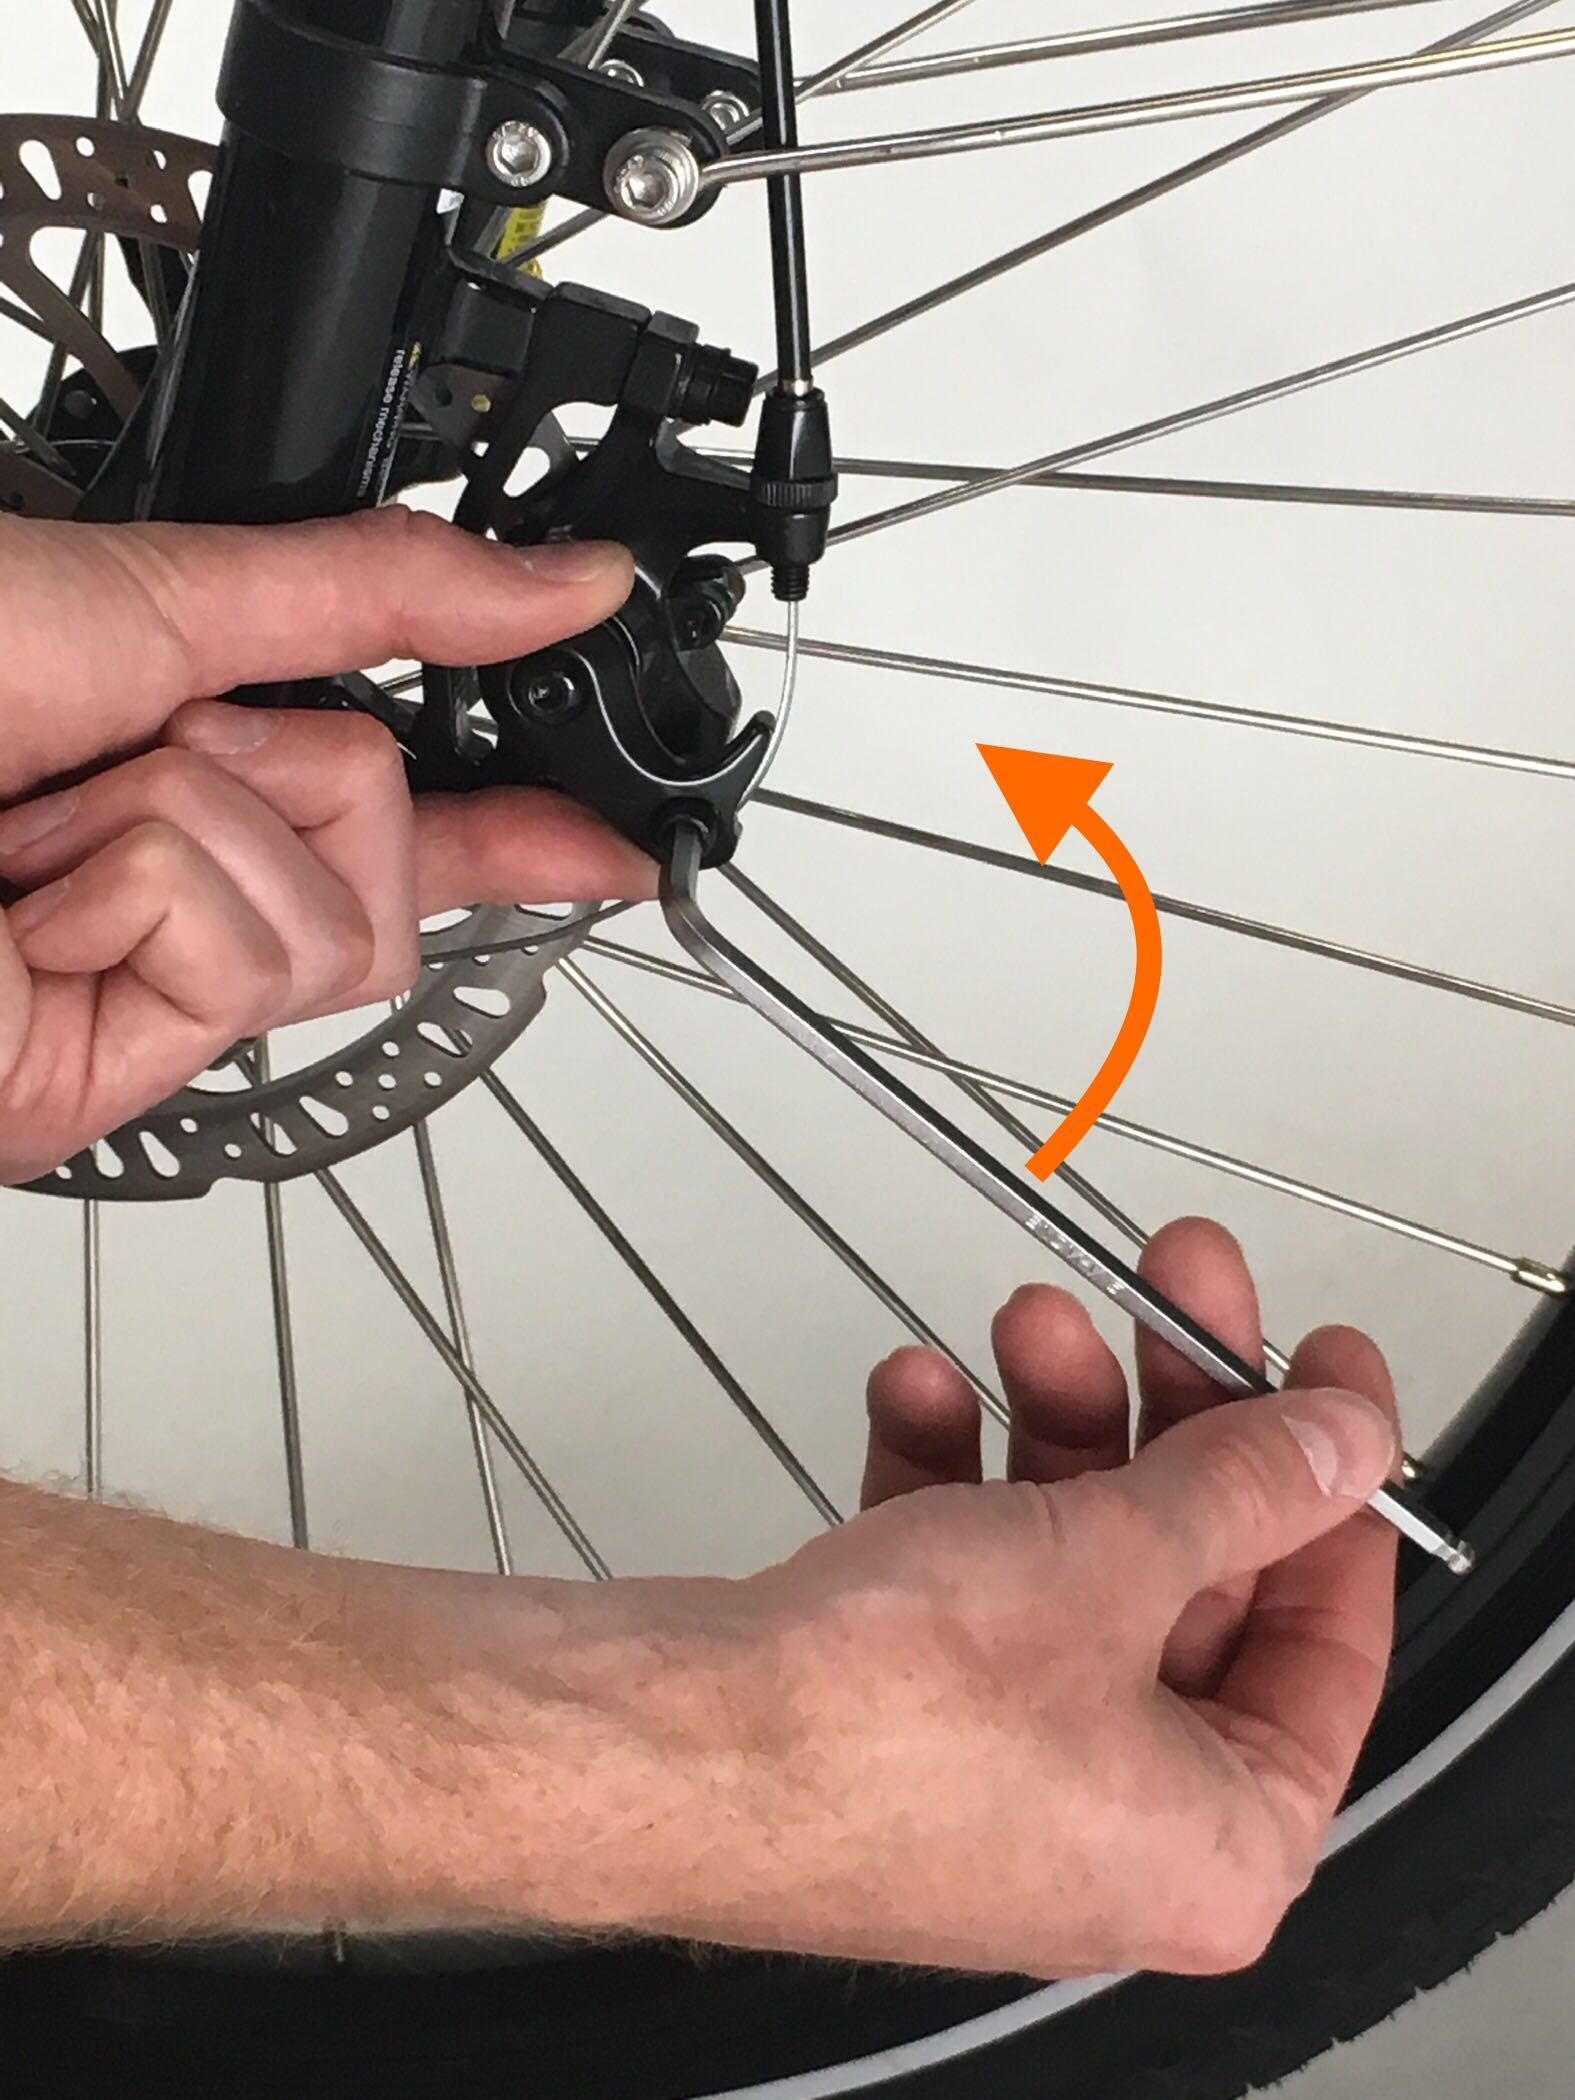 Disc Brake Adjustment – Rad Power Bikes Help Center